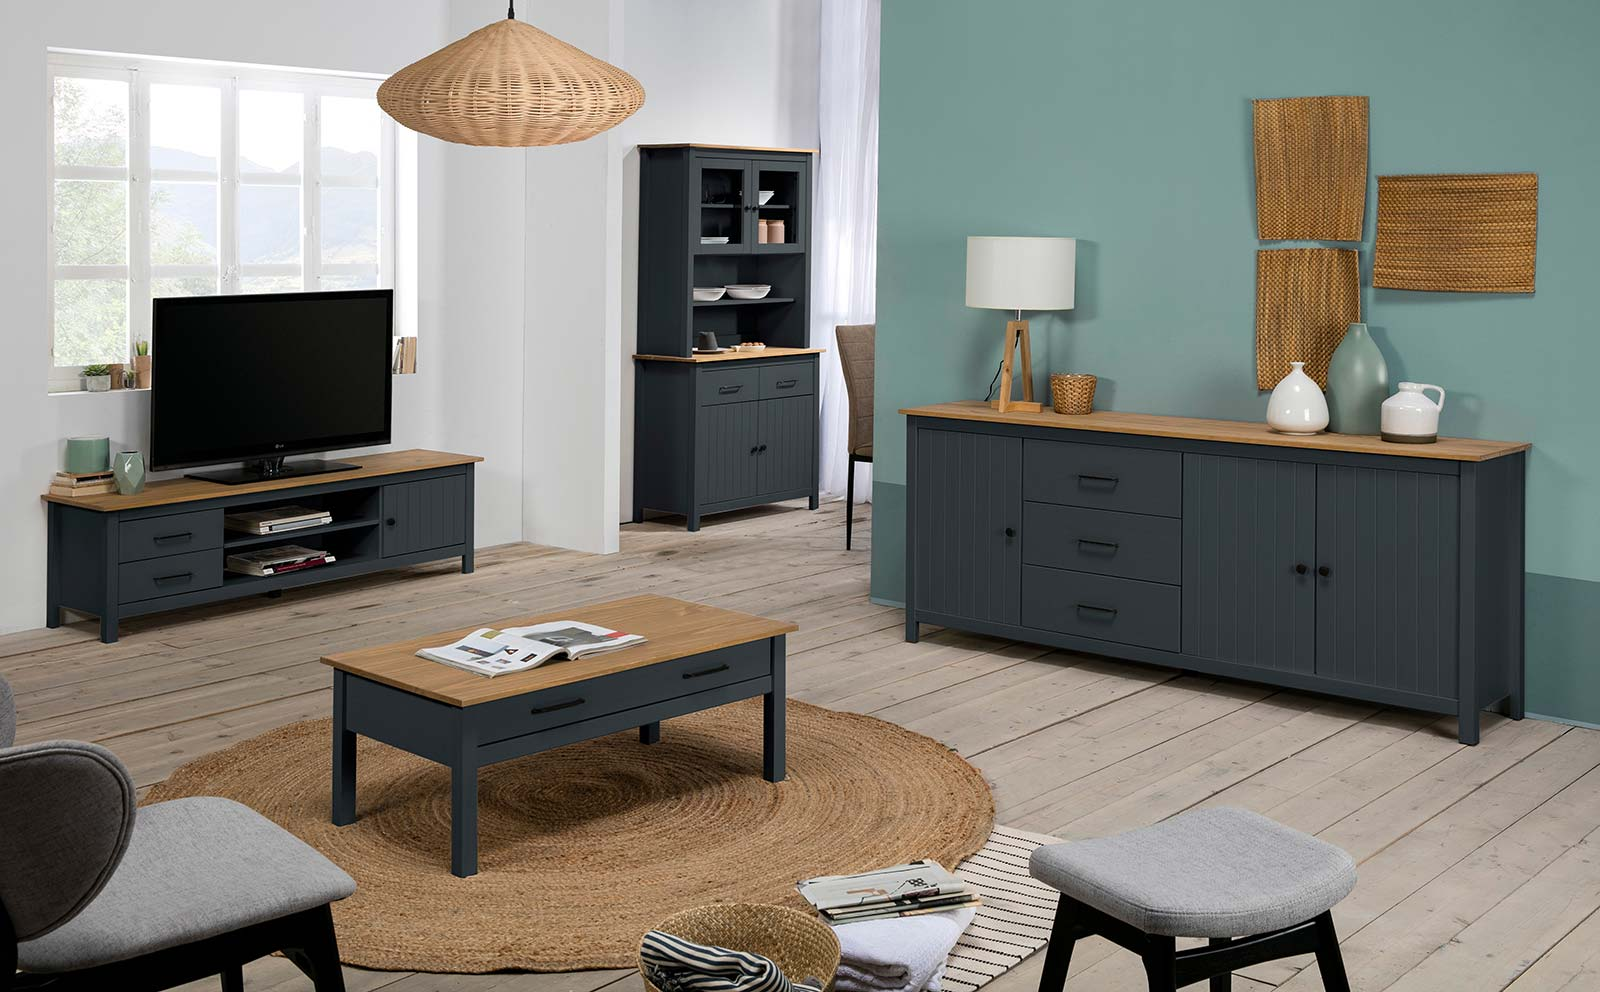 table basse Anversa Holland 13630 AM 2